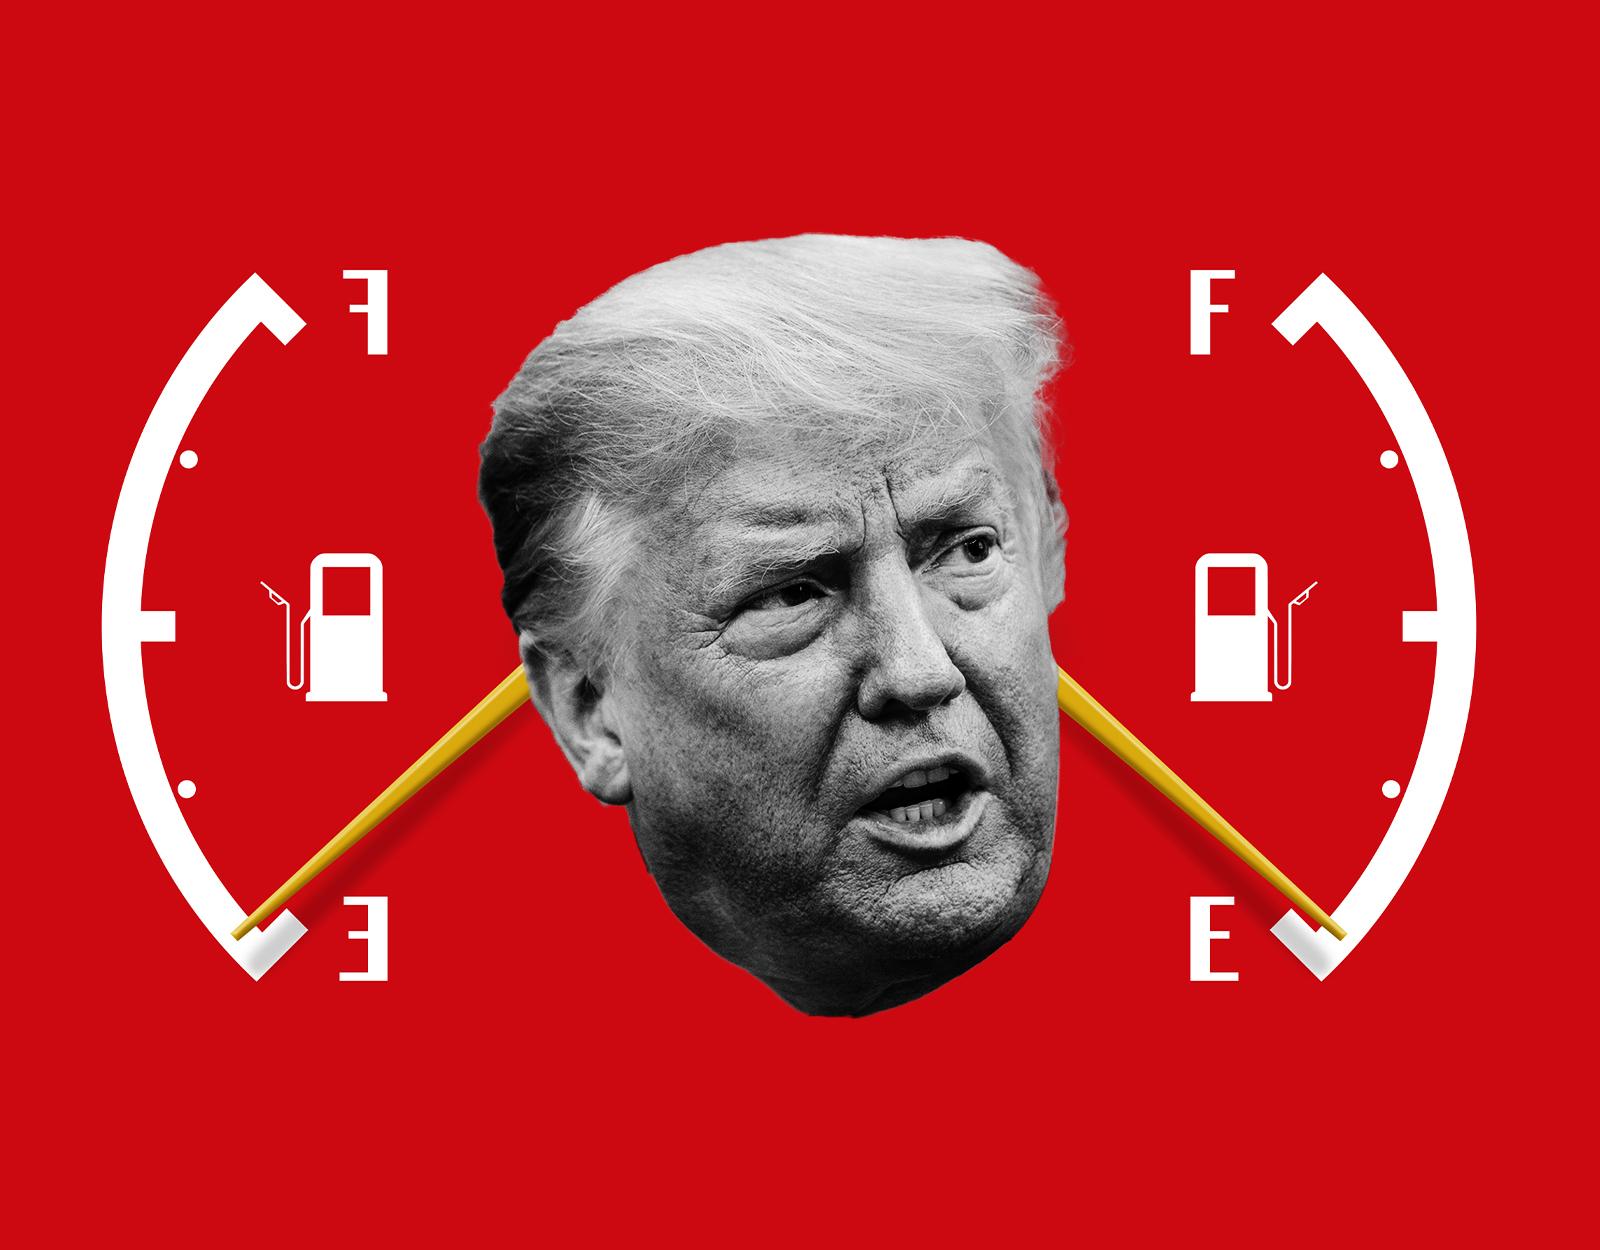 Low-Energy Trump - The Bulwark